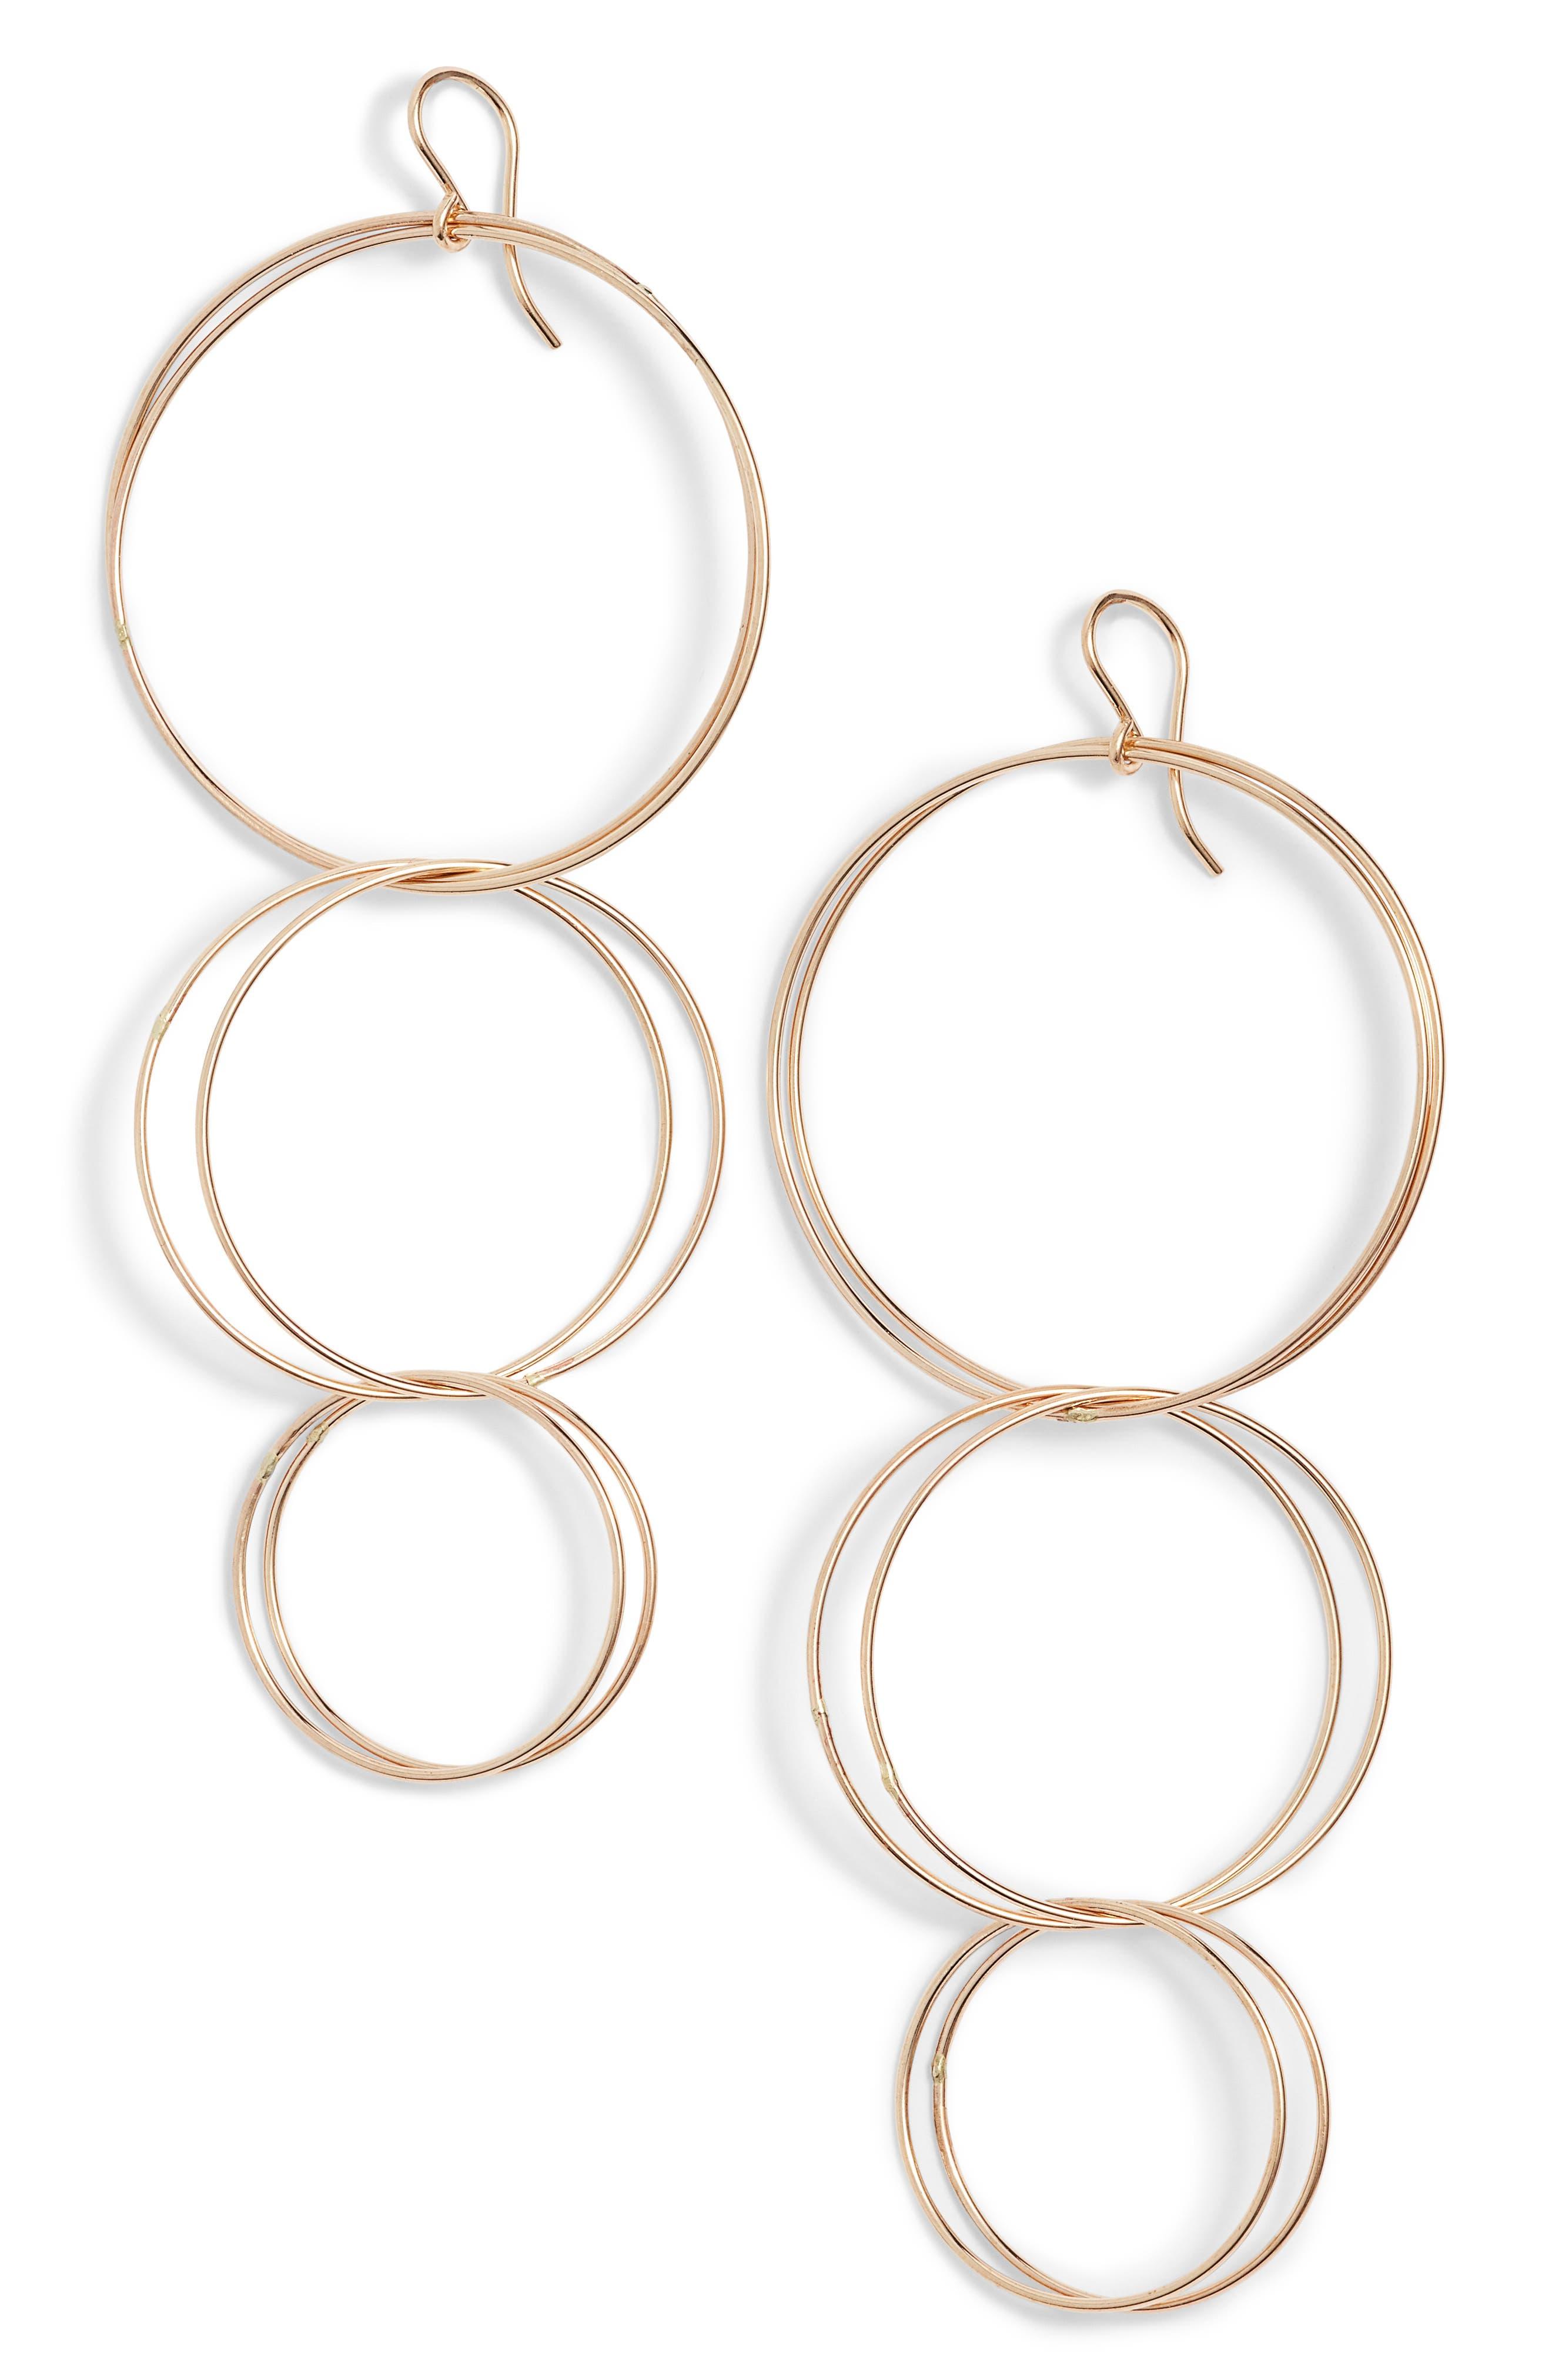 Triple Hoop Drop Earrings,                             Main thumbnail 1, color,                             Gold